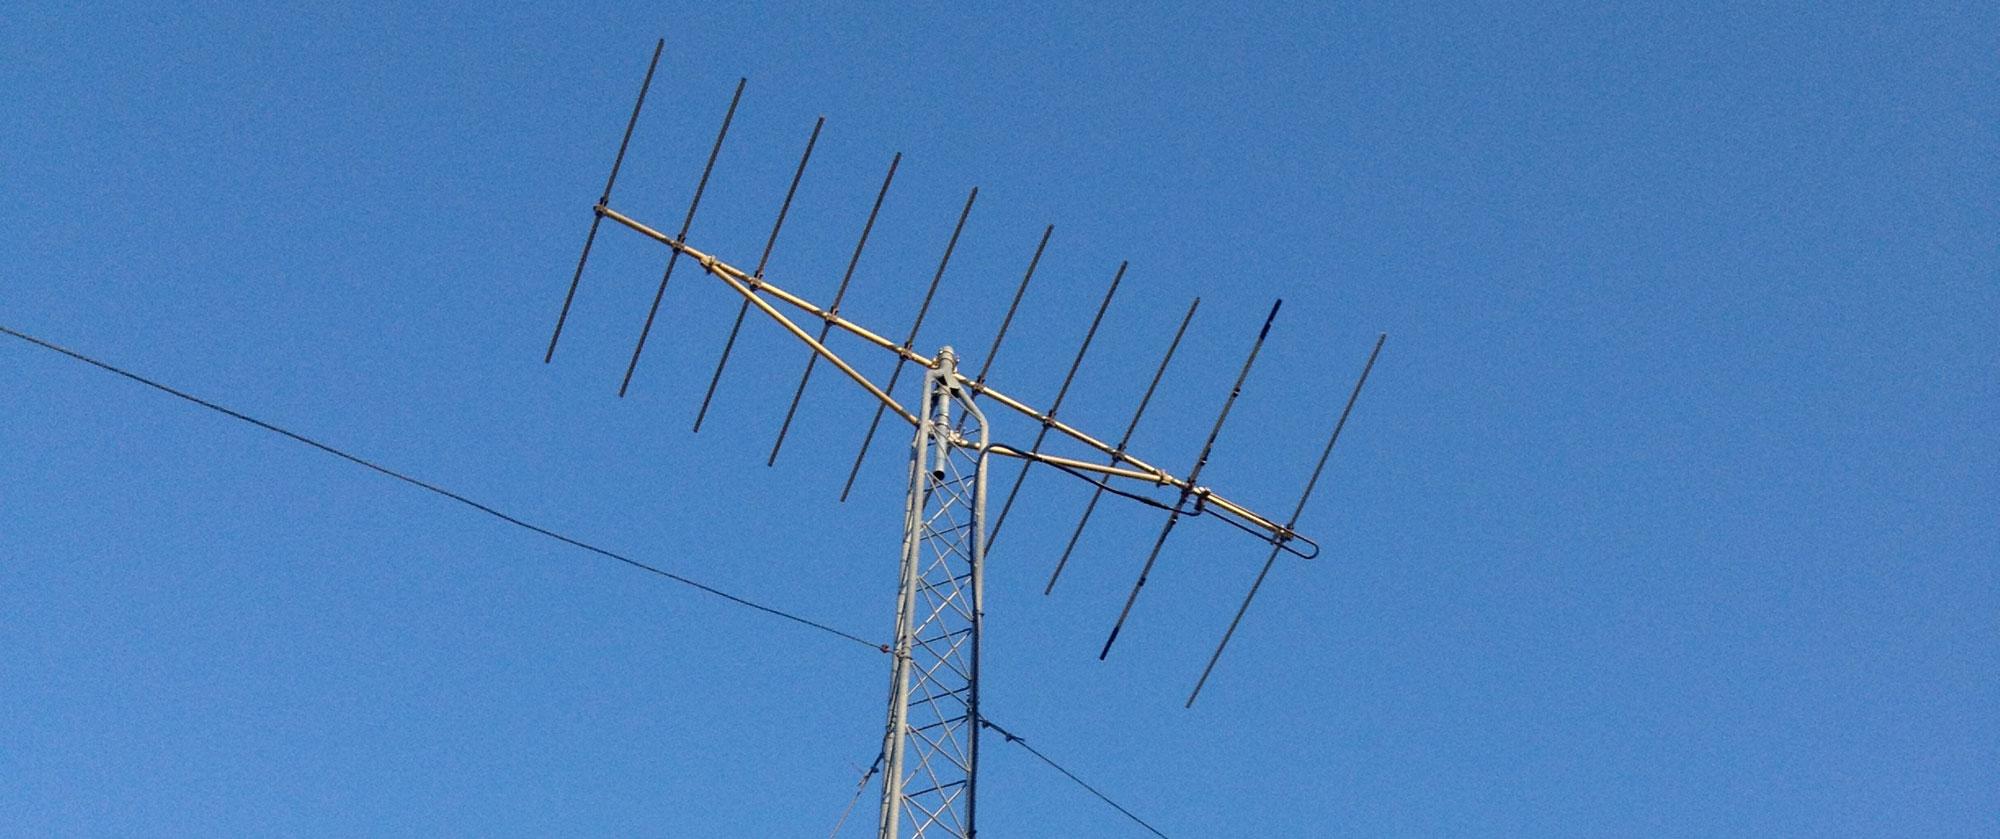 slider2-antenna